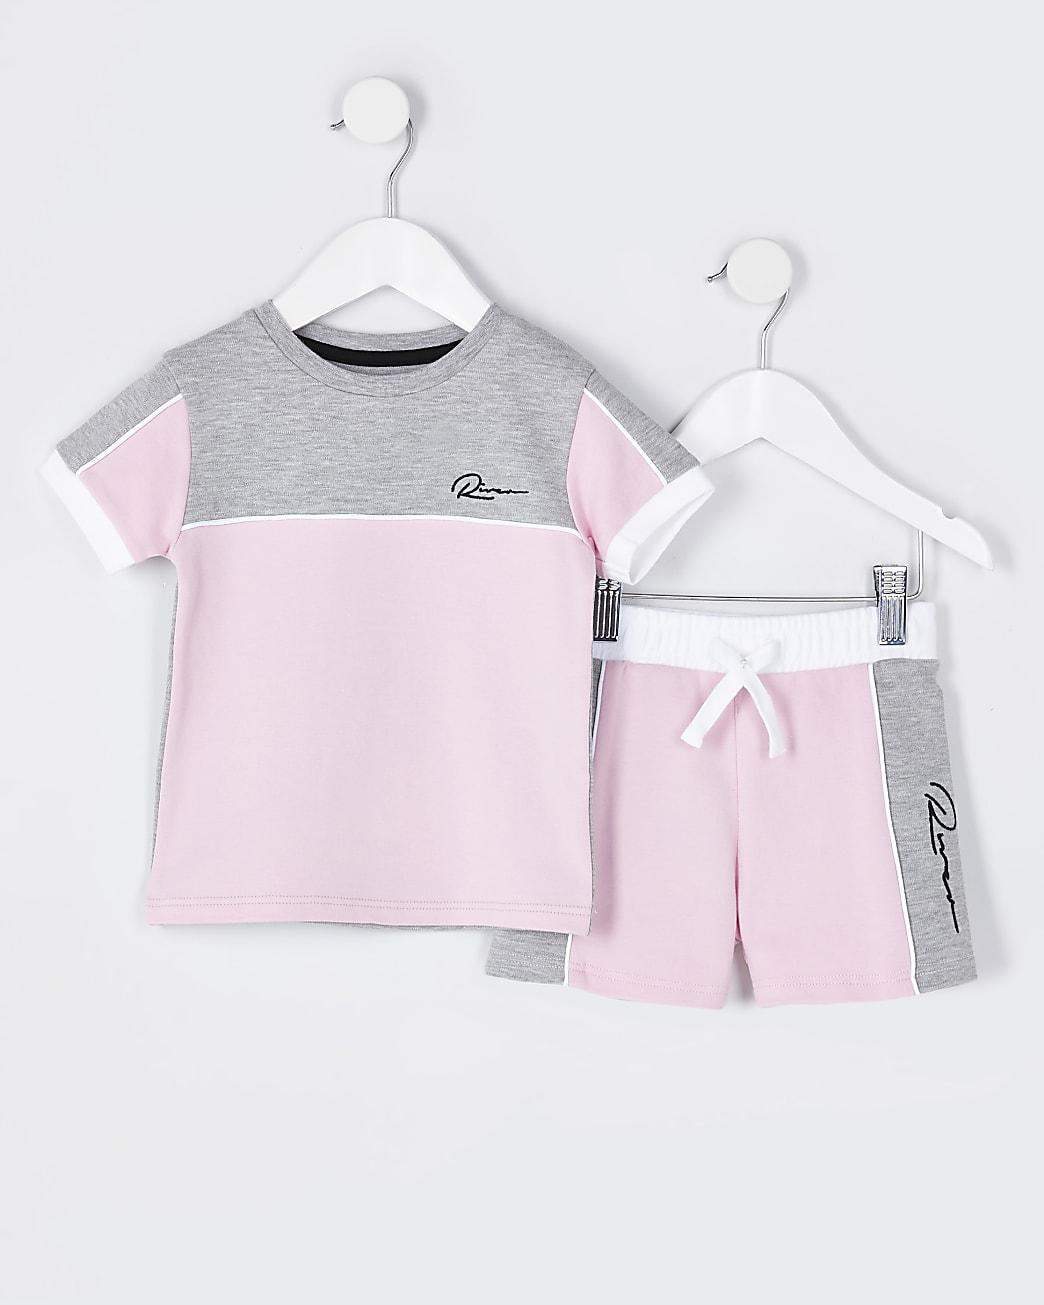 Mini boys pink RI t-shirt and shorts outfit